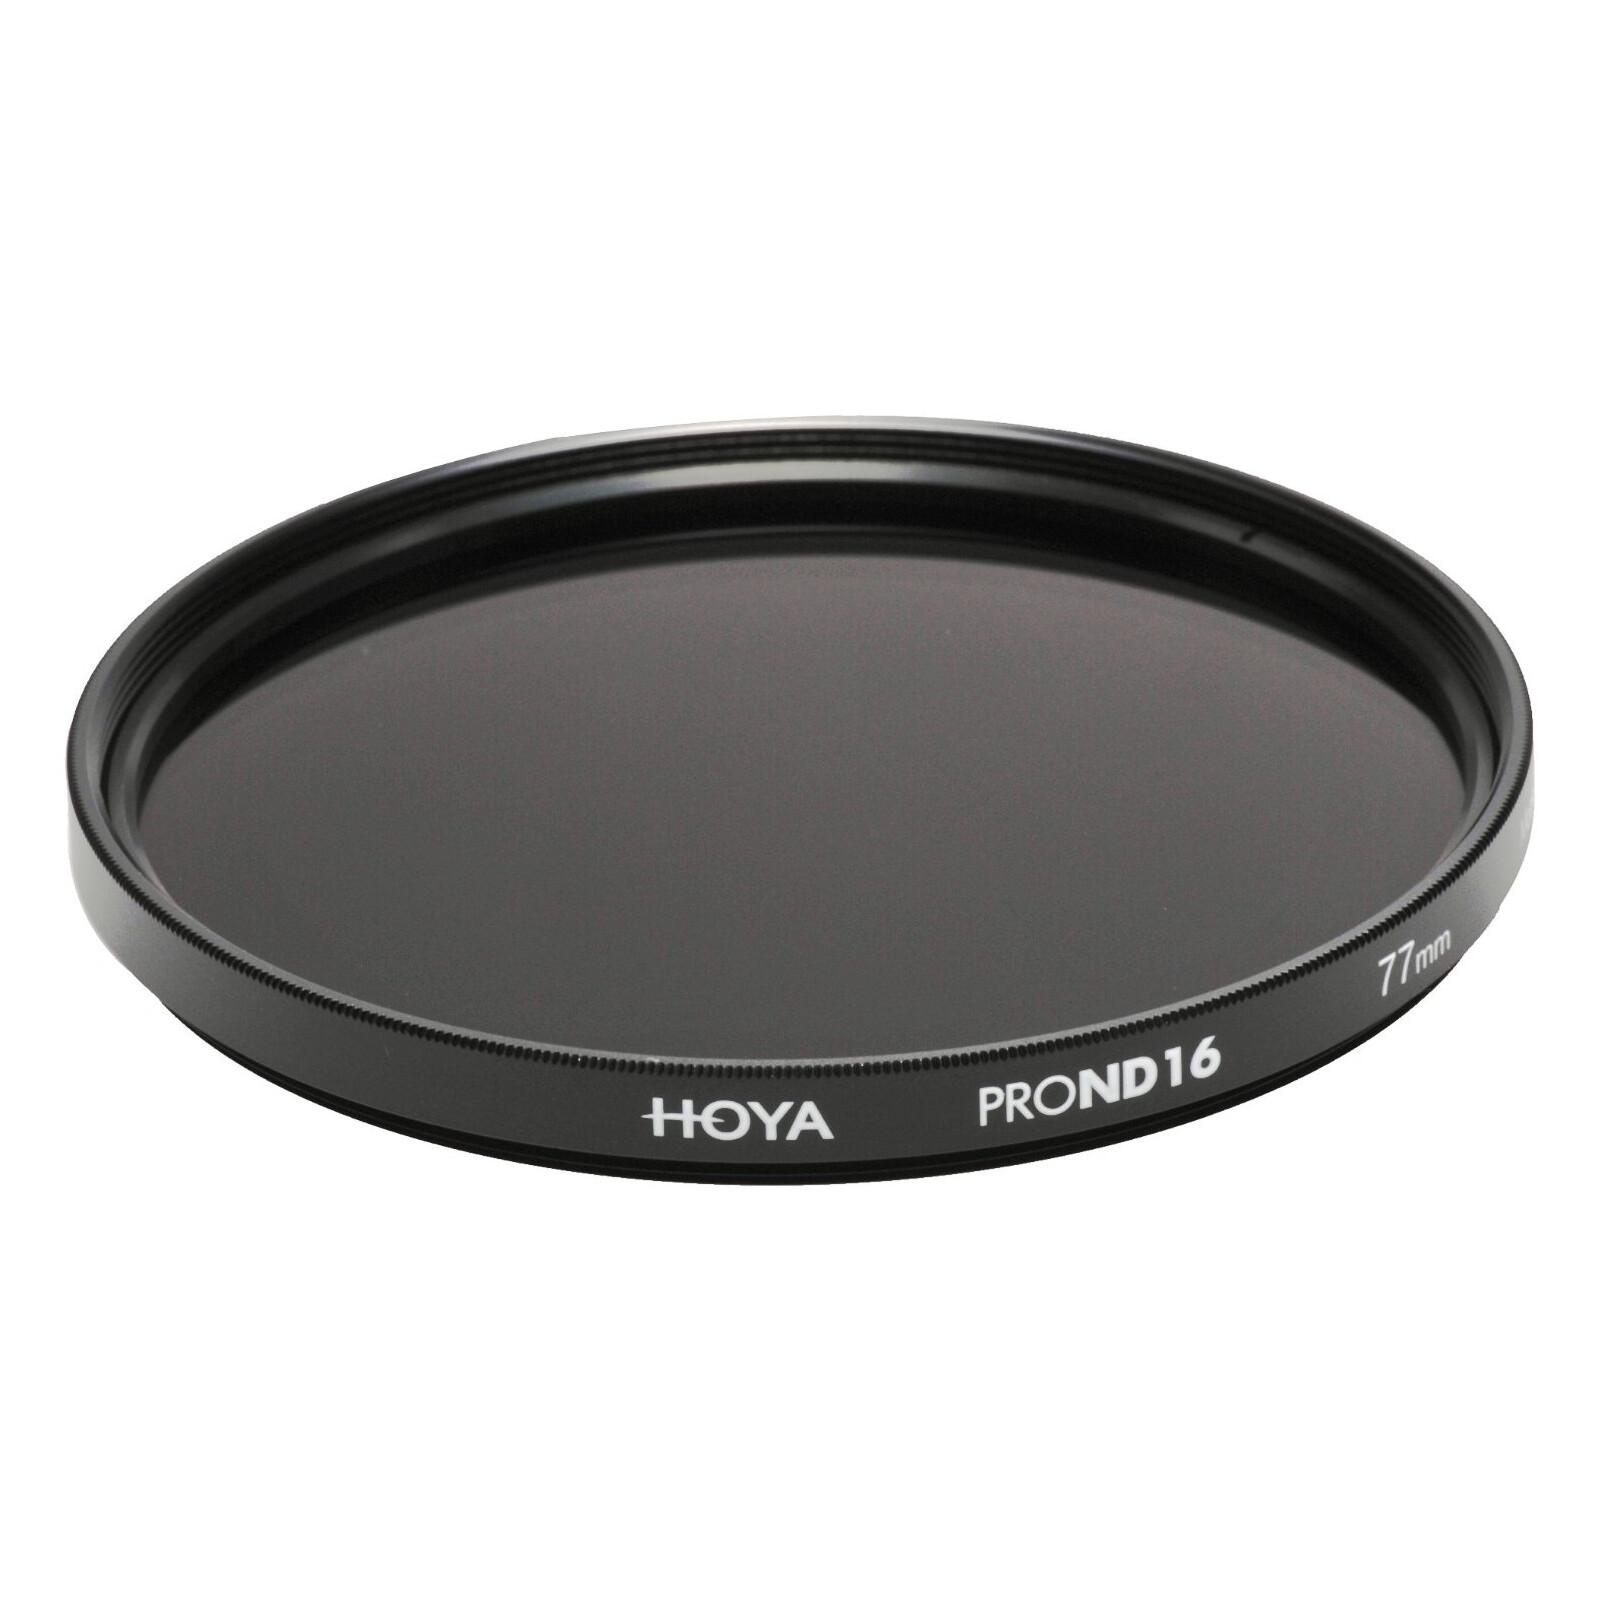 Hoya Grau PRO ND 16 82mm